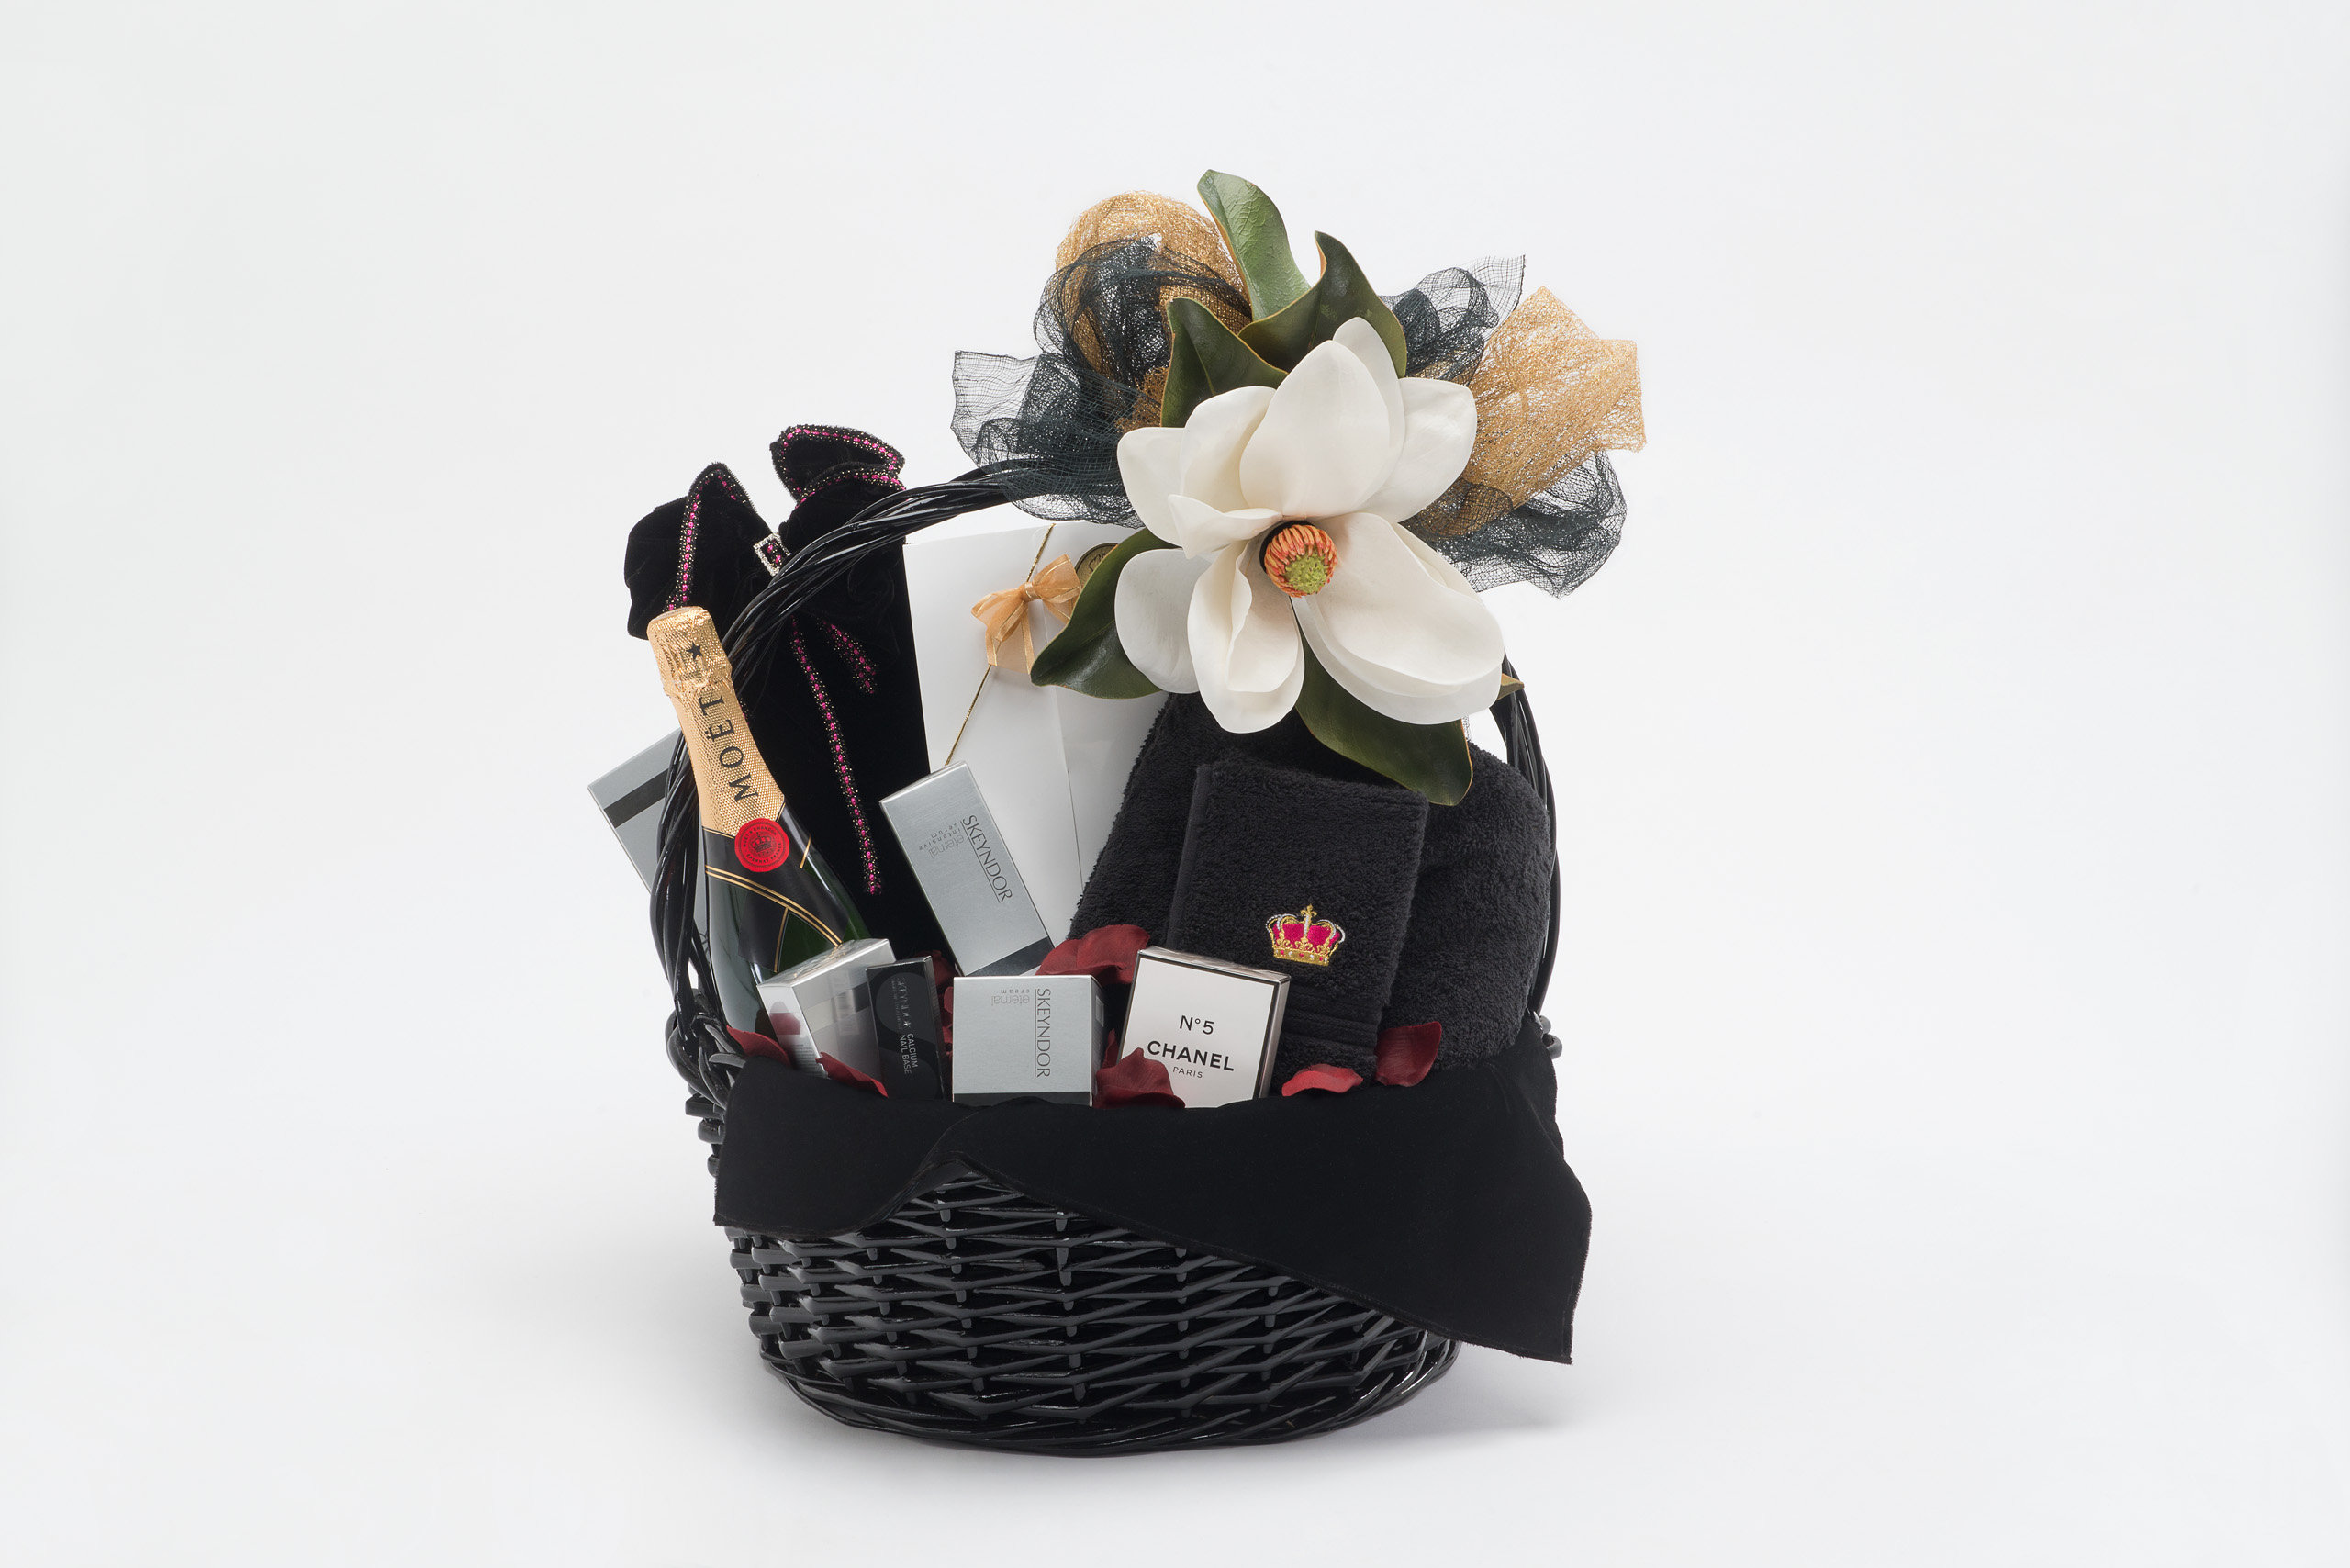 White & Rose Gold Ring+Roses+Versace+Limo+Basket+Hamper+Pampering